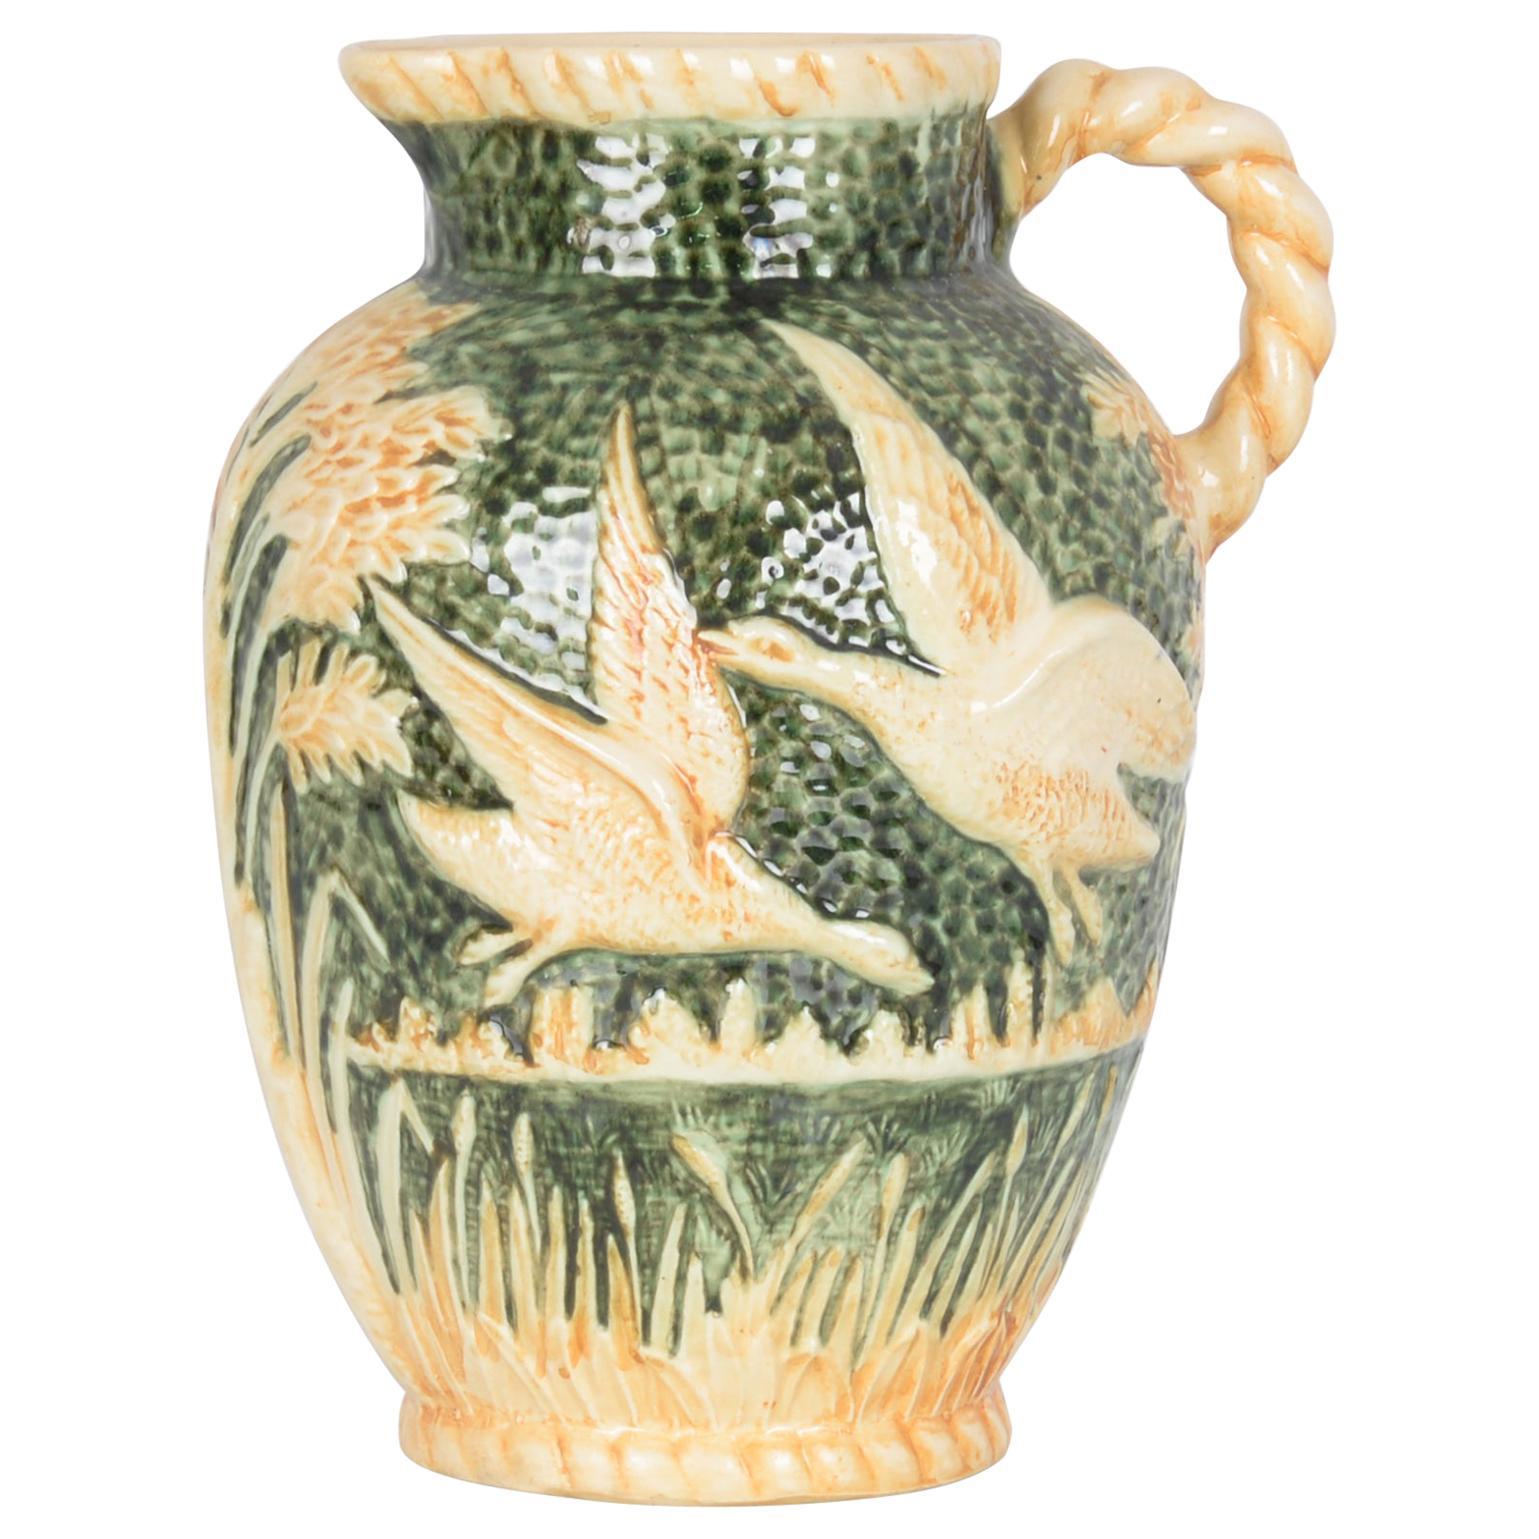 Vintage Ornate Belgian Green Ceramic Vase